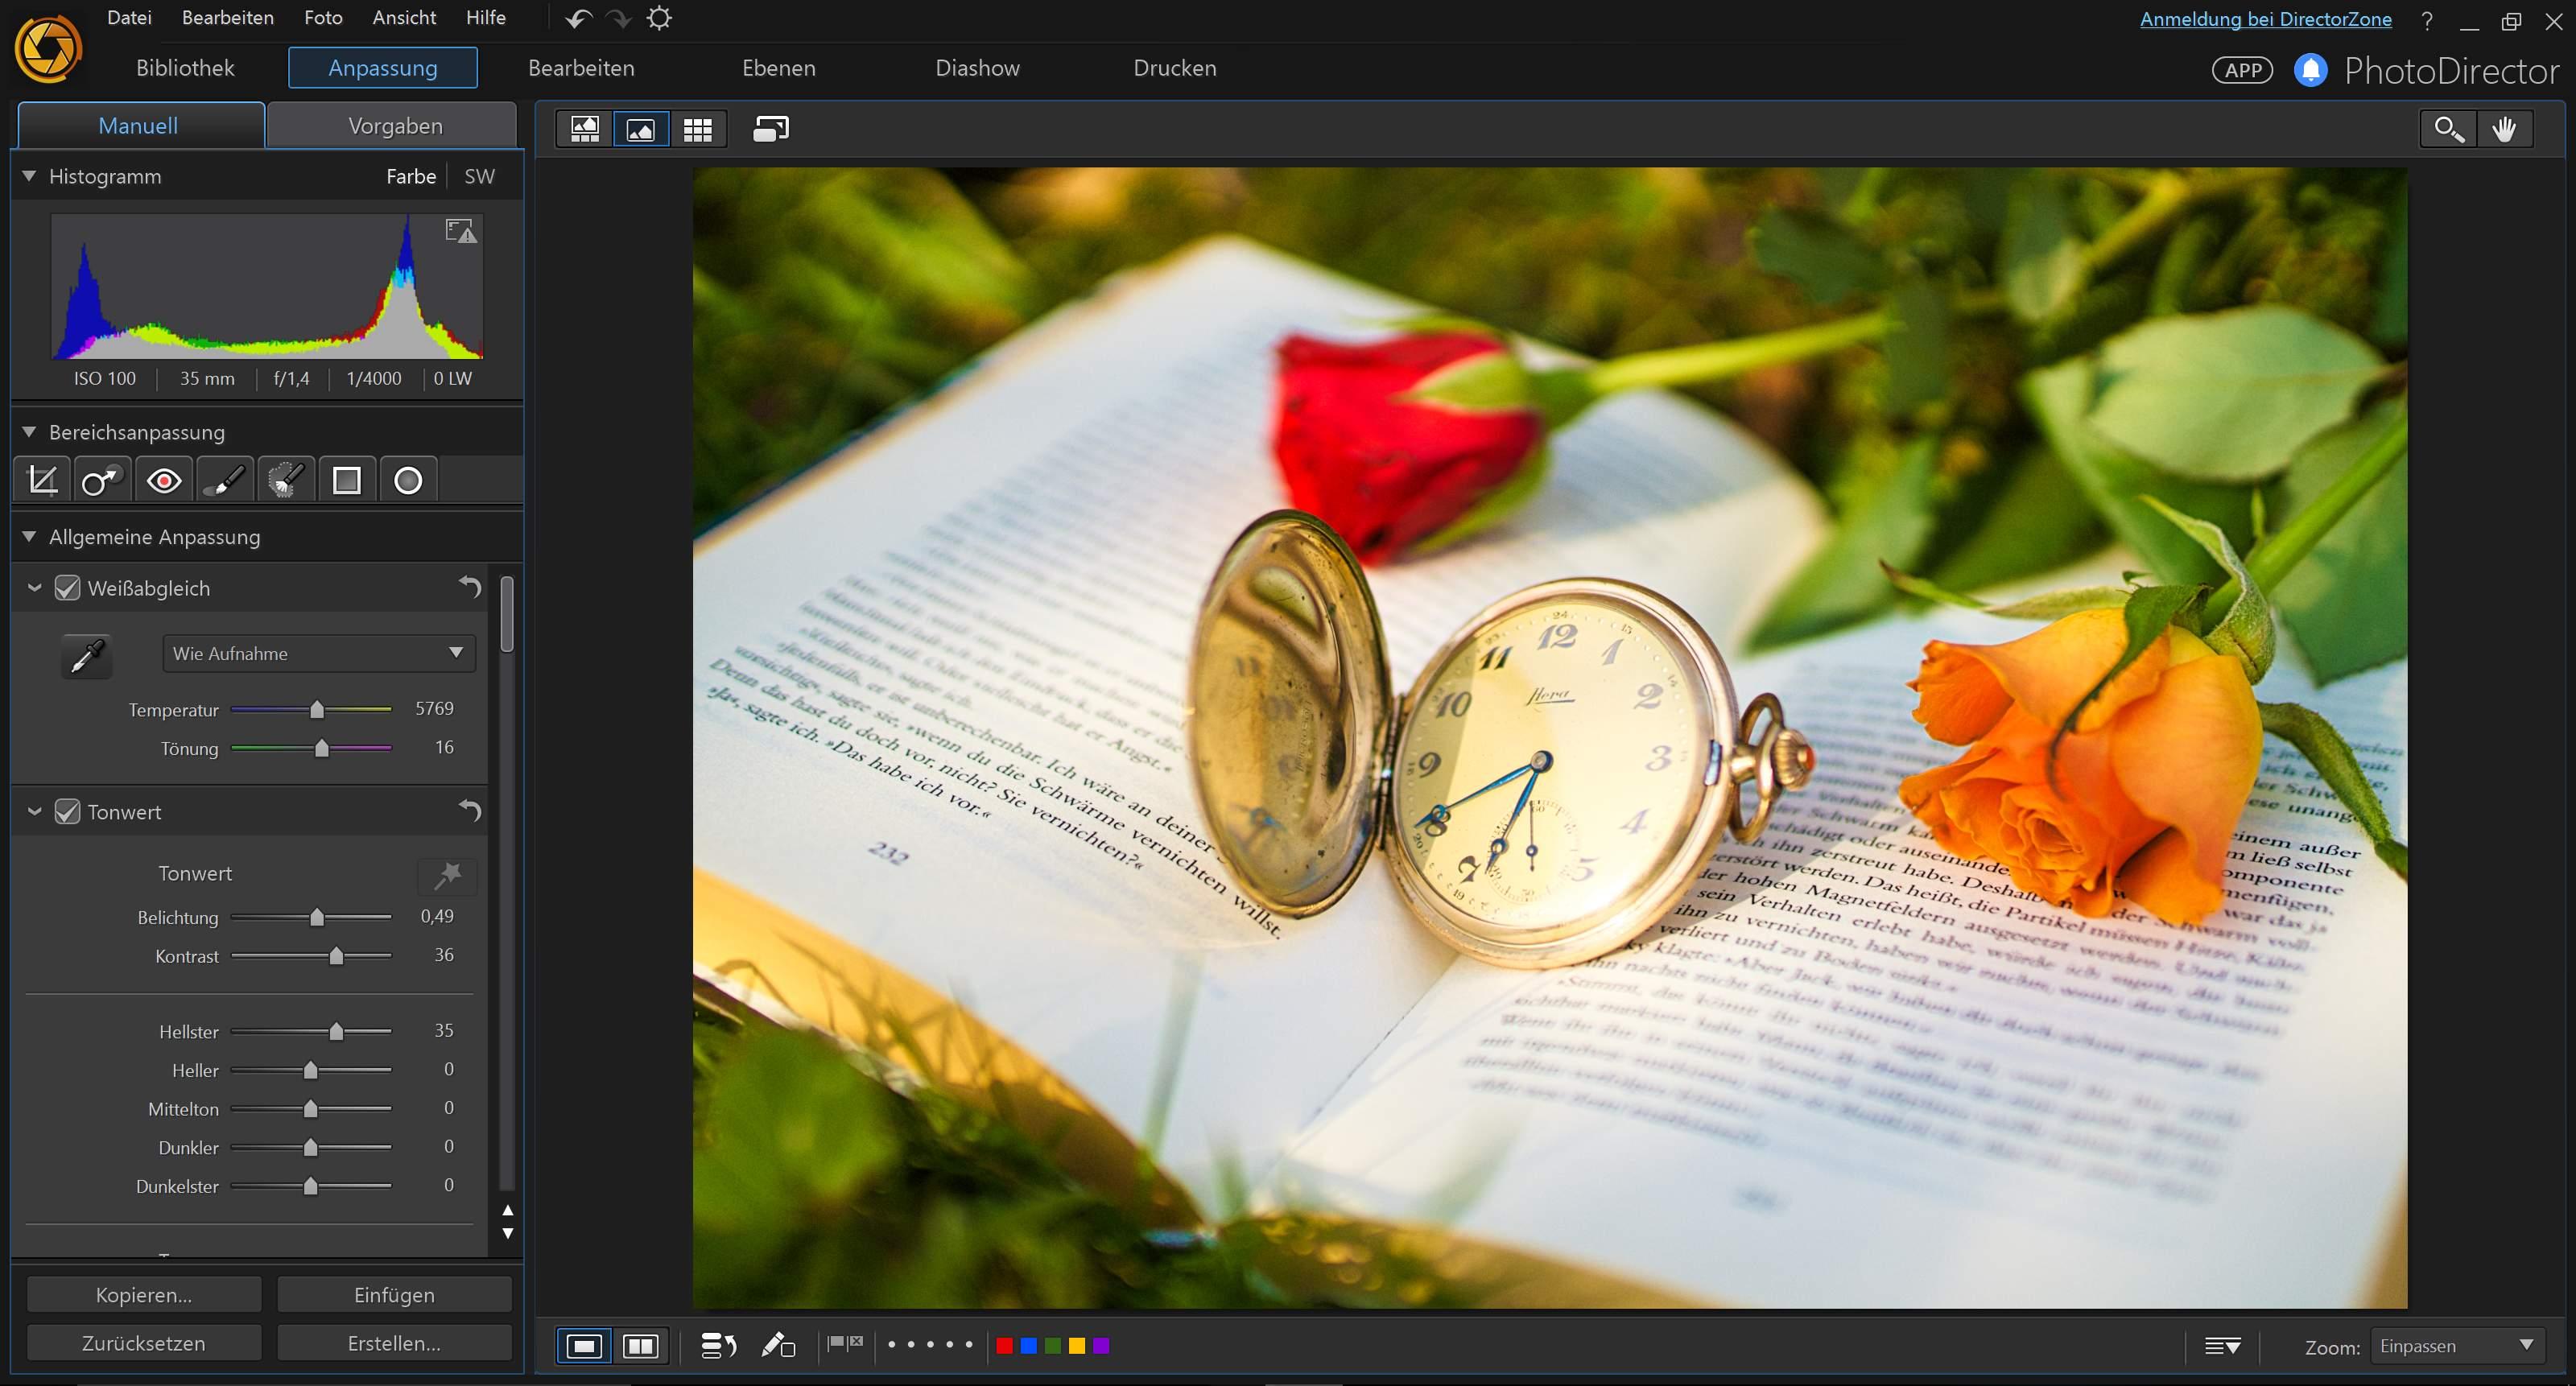 how to use cyberlink photodirector